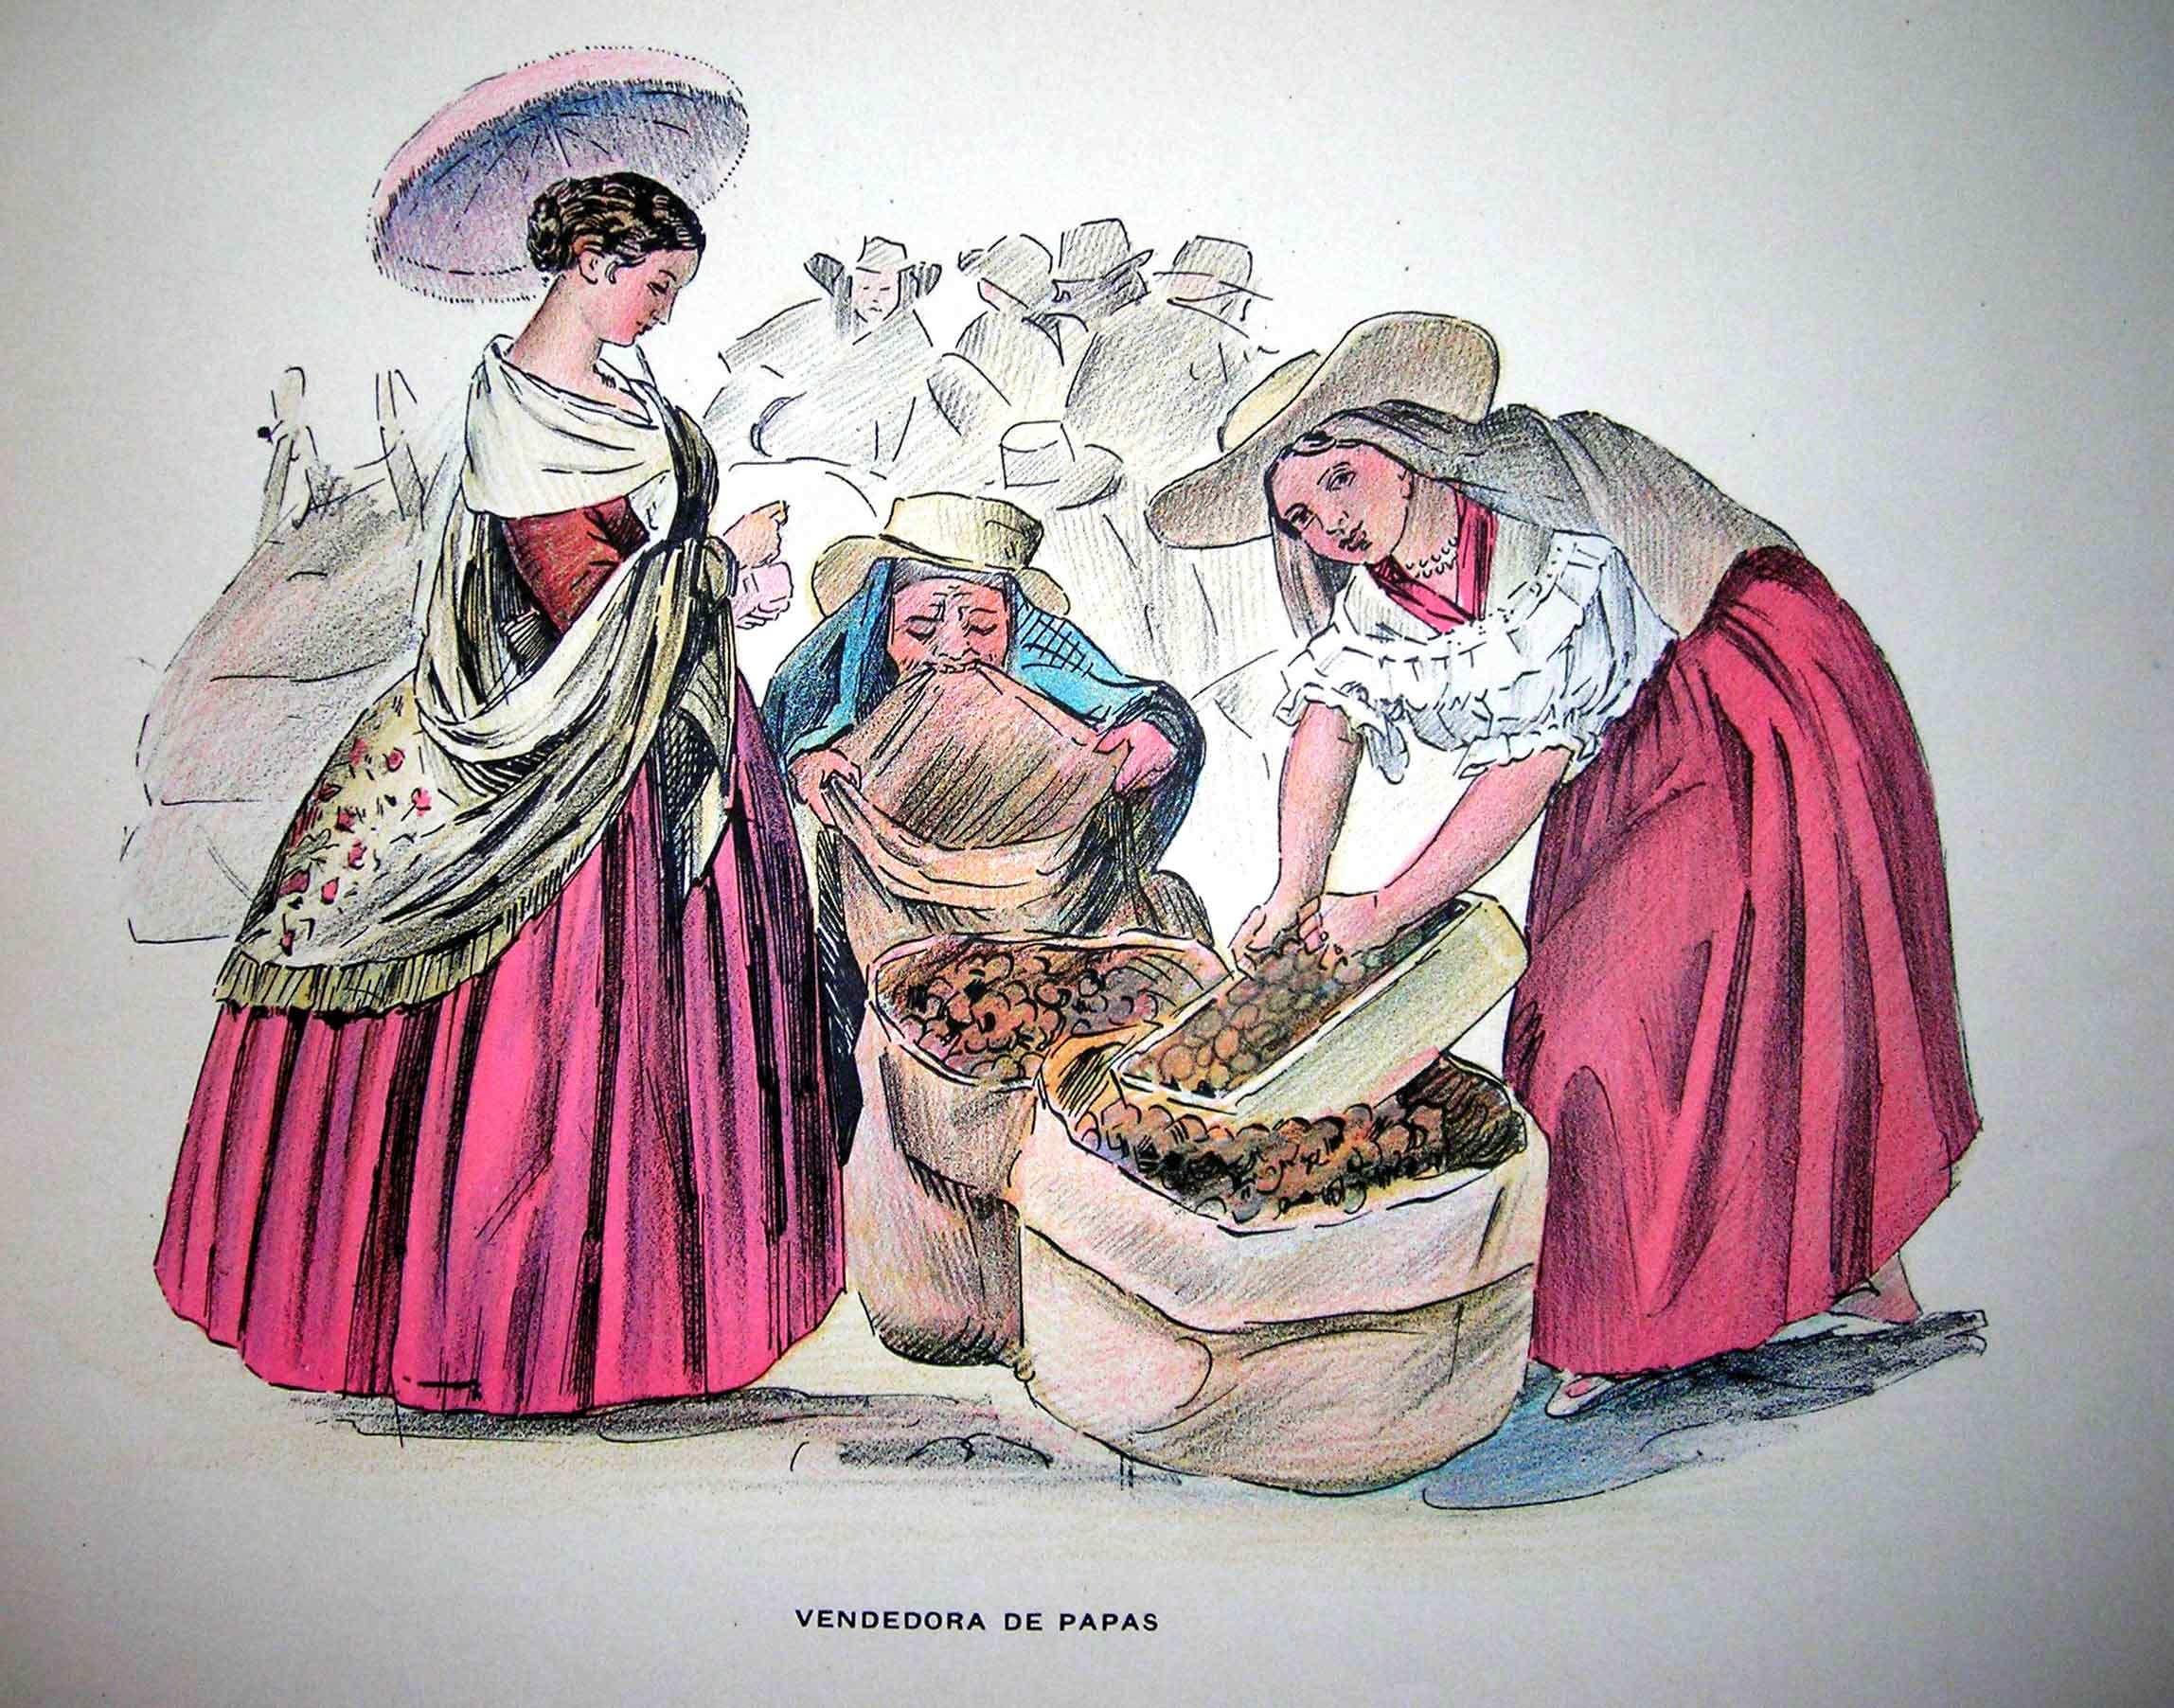 vendedoras de papa en la etapa colonial